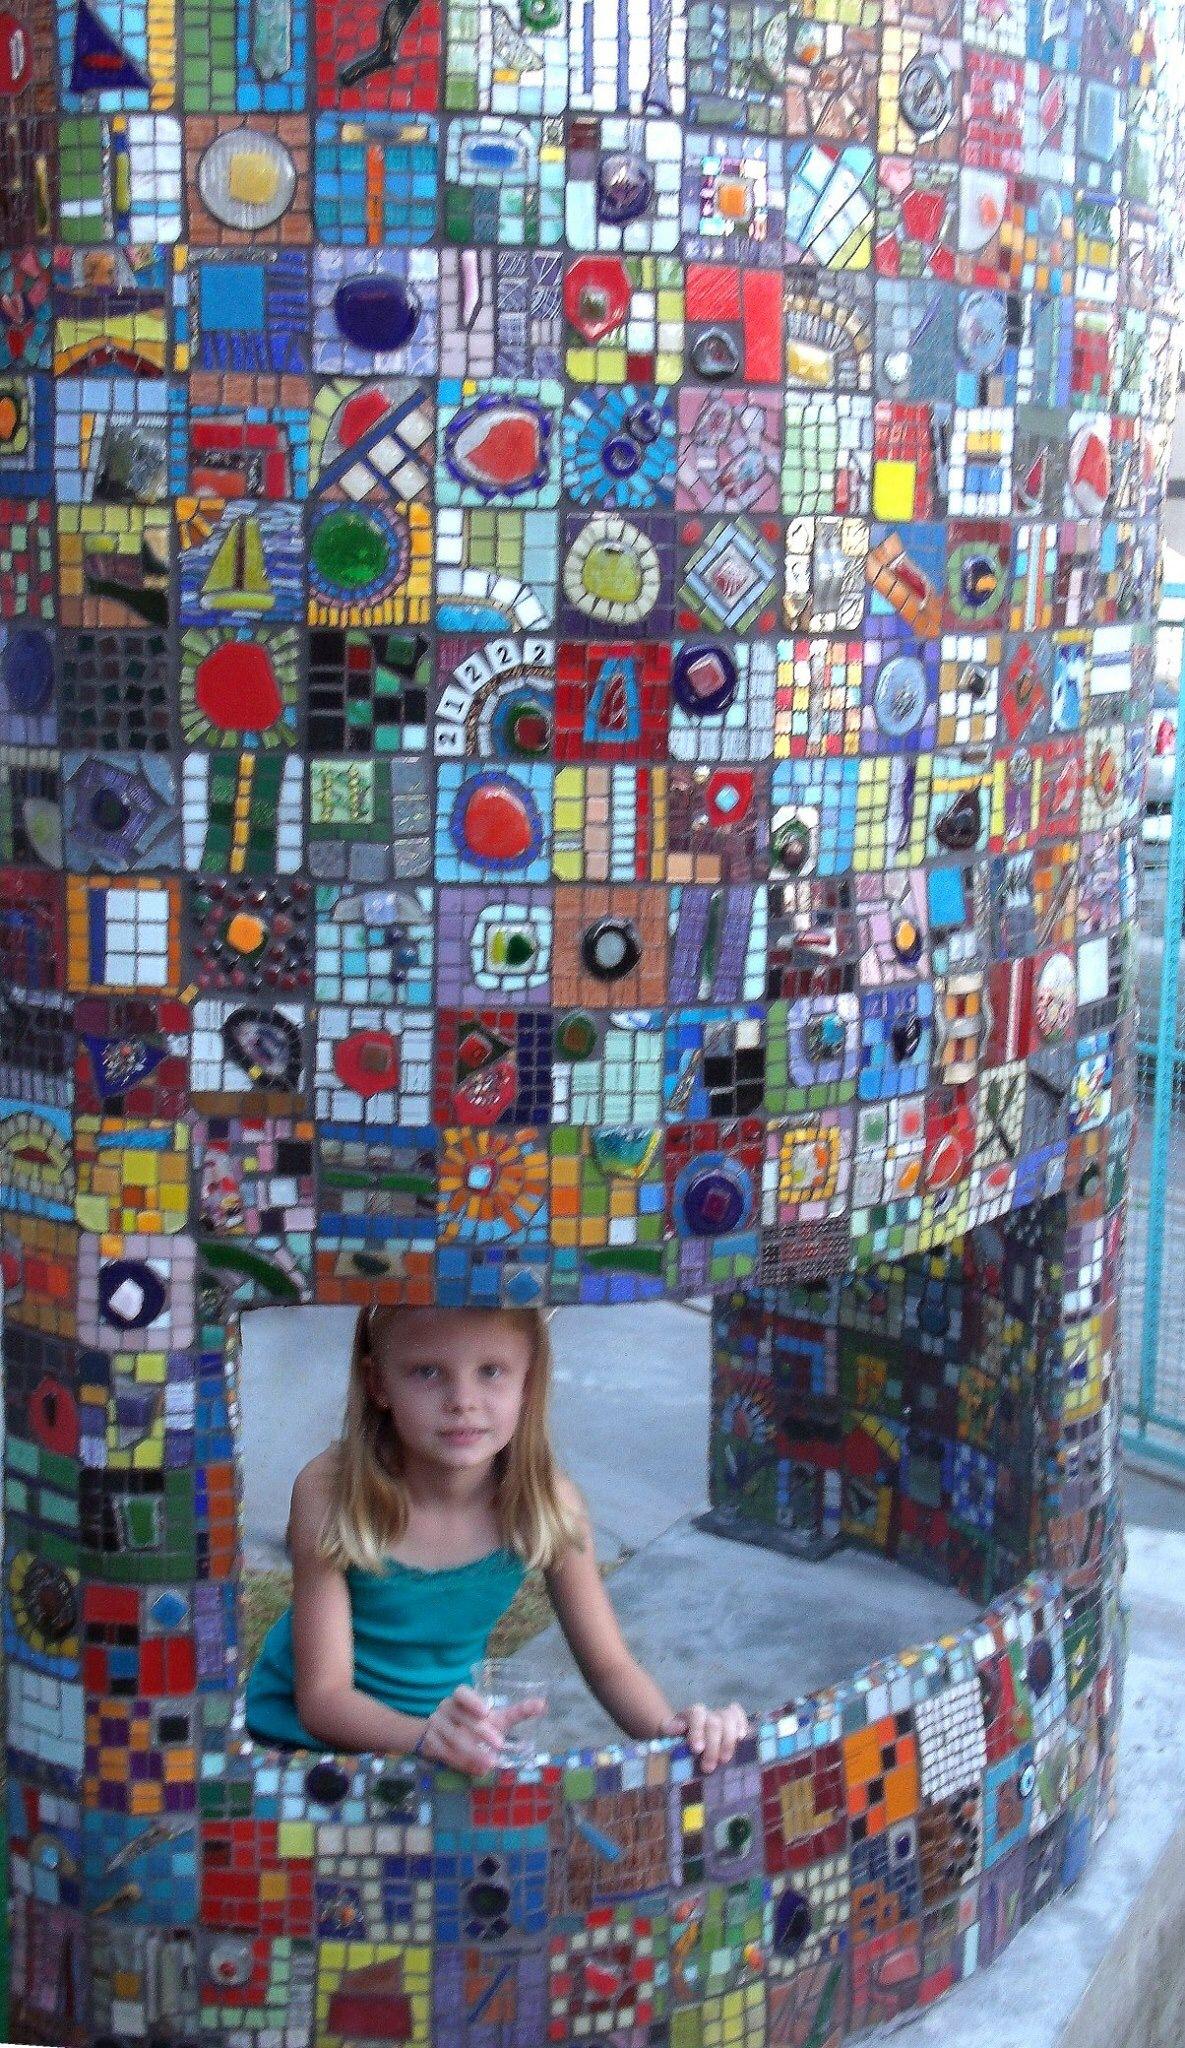 Pin by clauvrarei on mosaic wall art   Mosaic murals, Mosaic art ...